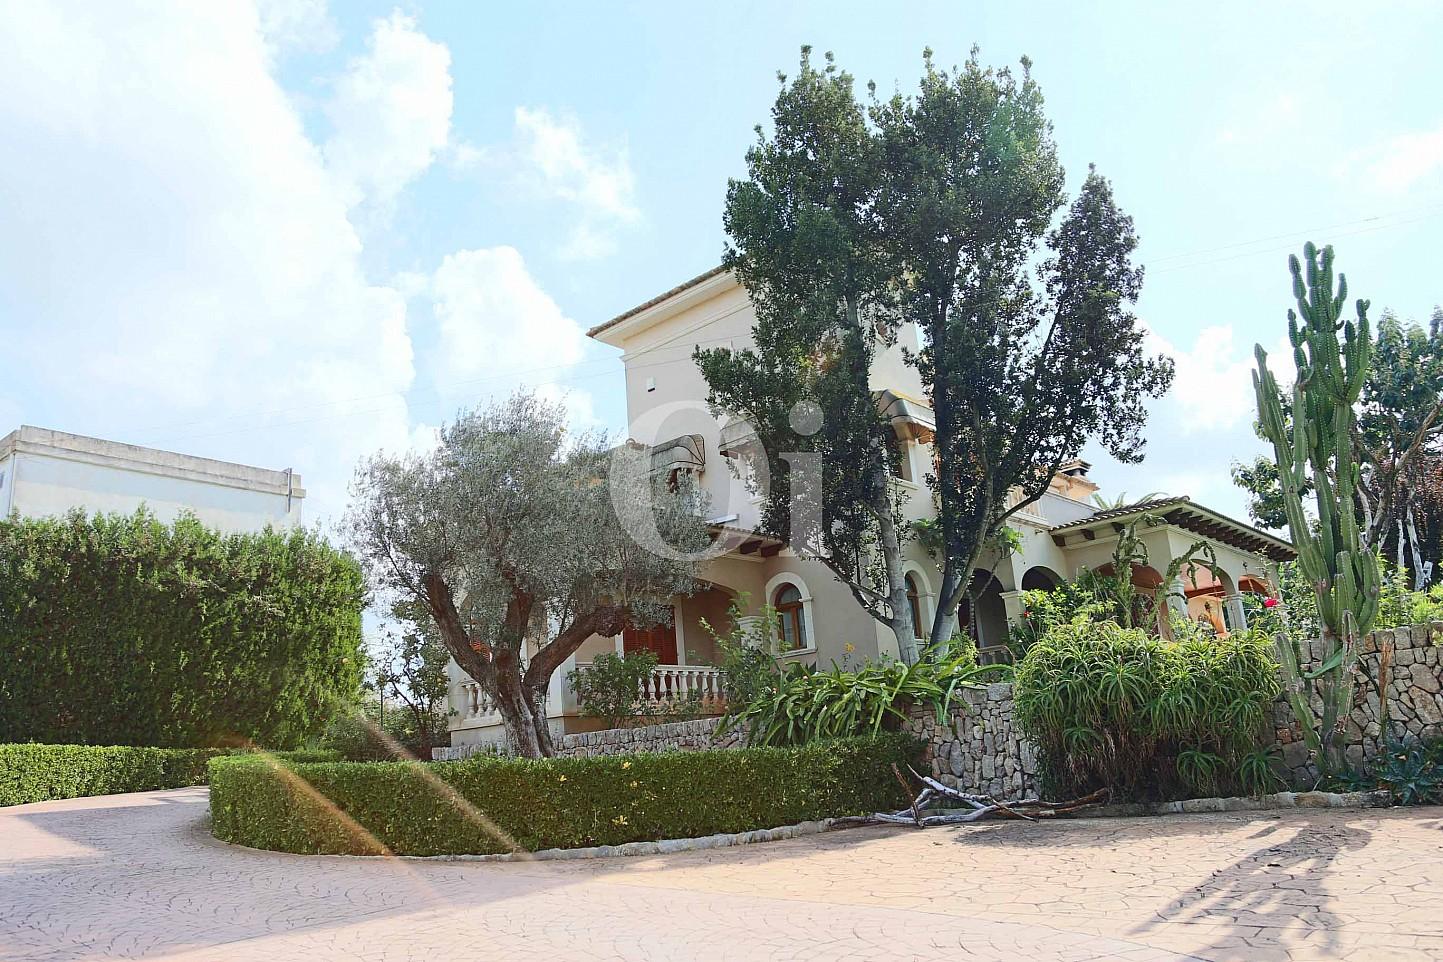 Vila luxosa n venda a Sant Llorenç, Mallorca